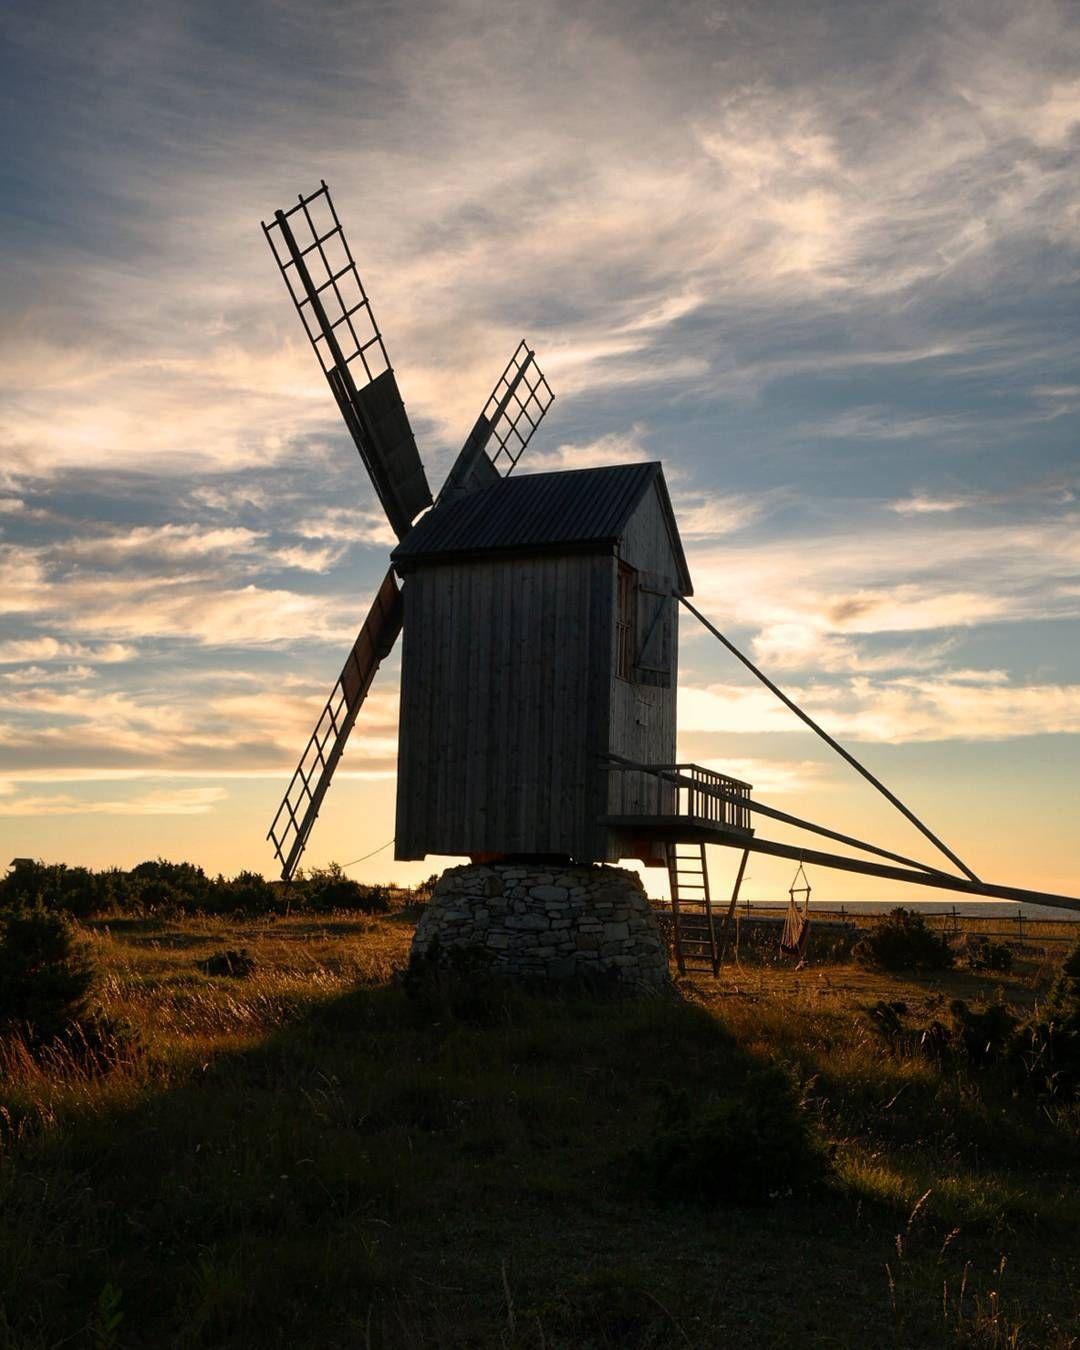 Windmill, Saaremaa island, Estonia